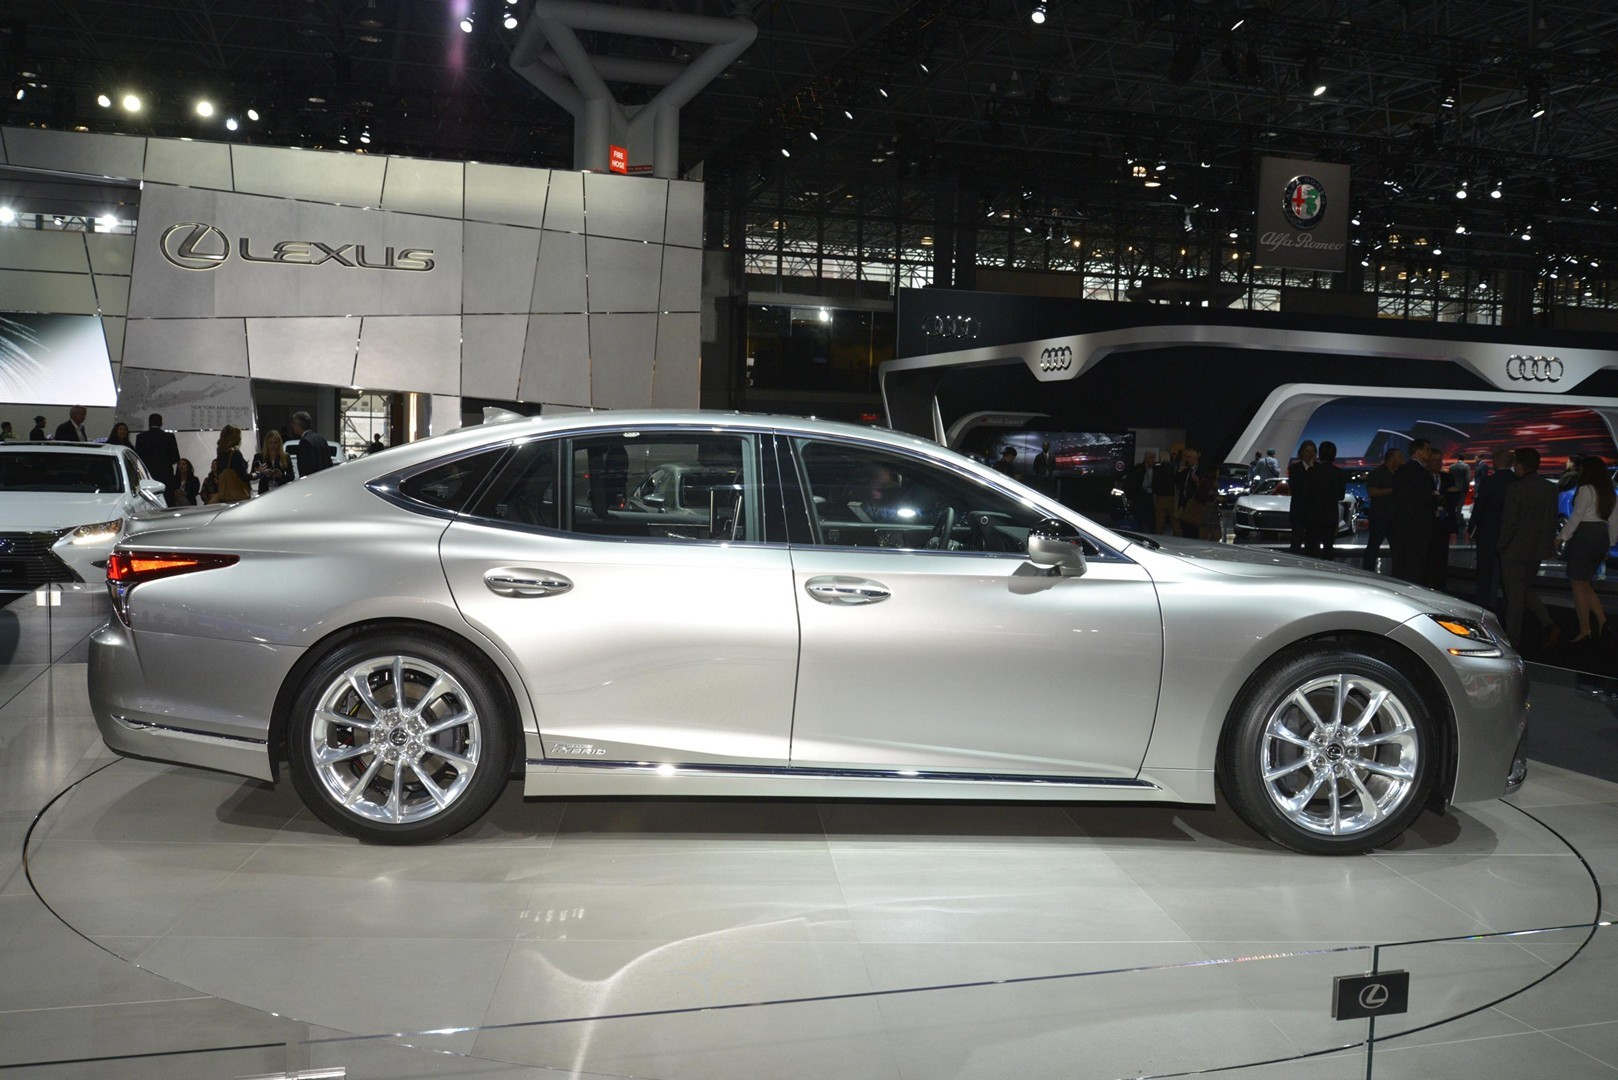 2018 Lexus LS F-Sport Joins LS 500h in New York ...